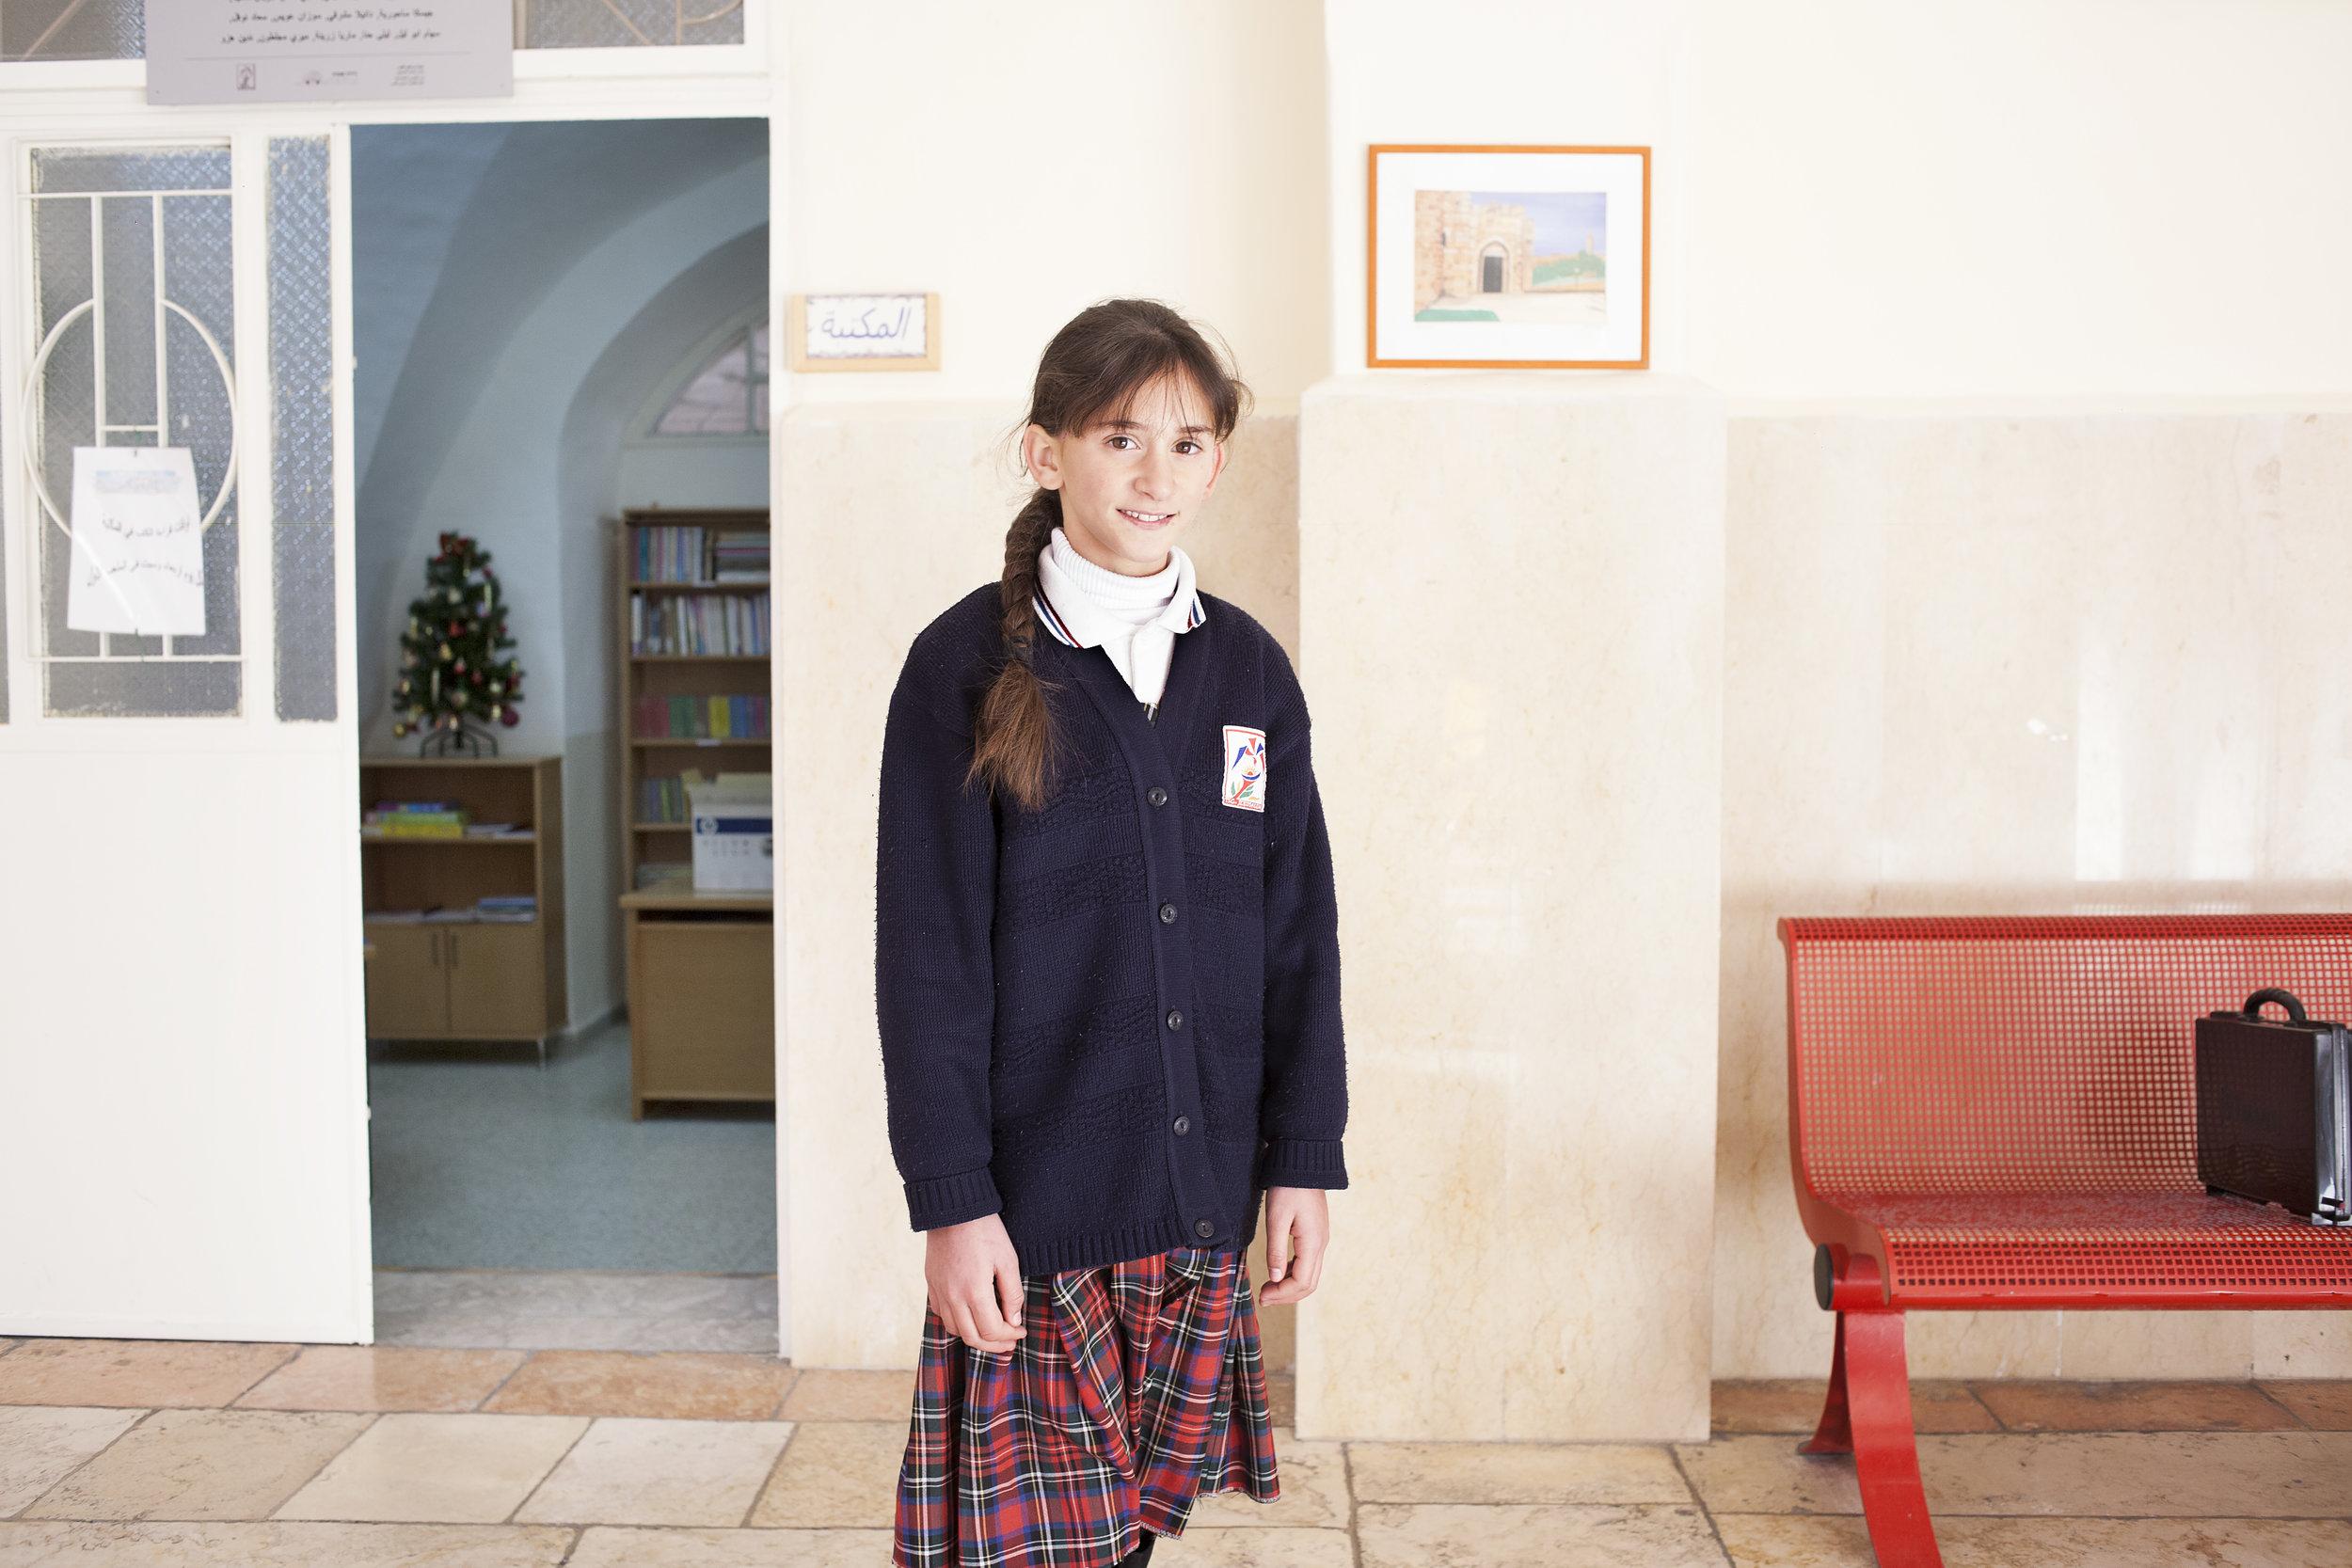 Terra Santa girls' school in the Old City, Jerusalem